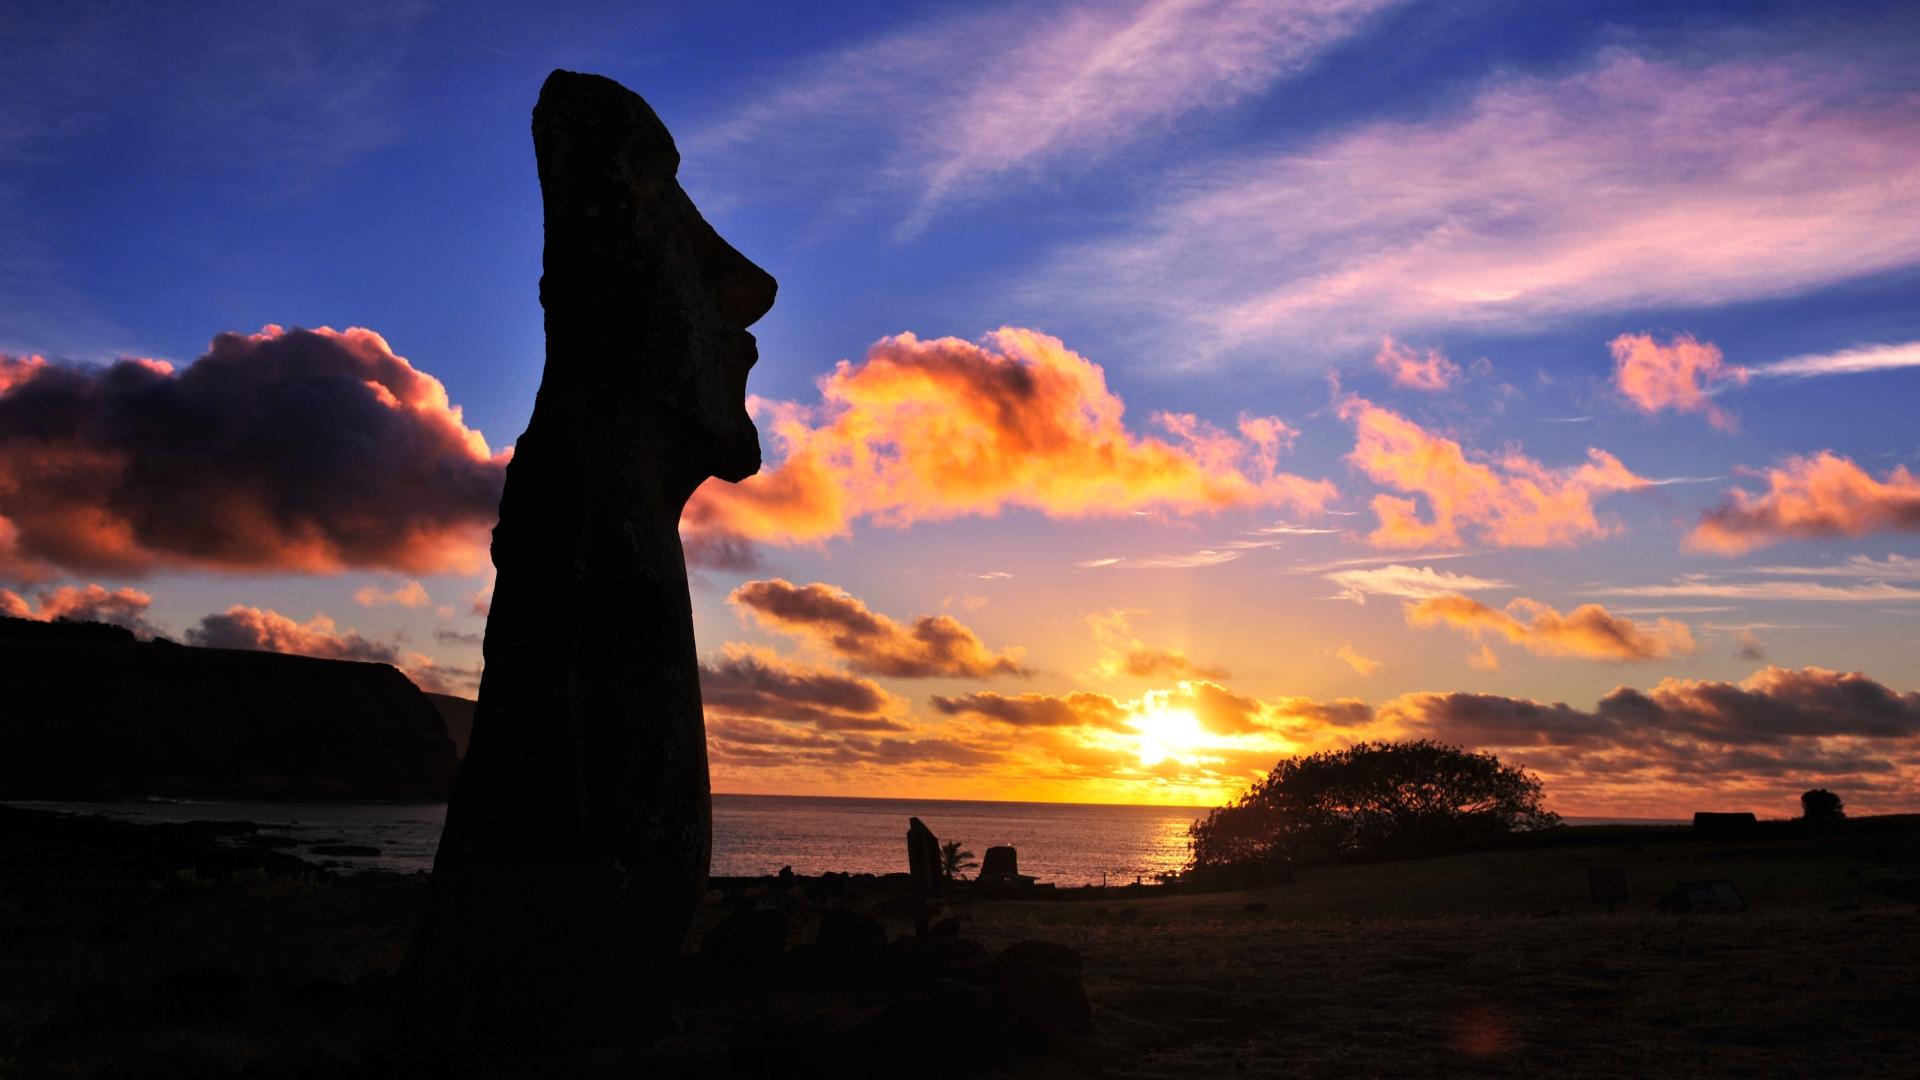 sunset silhouette wallpaper 38076